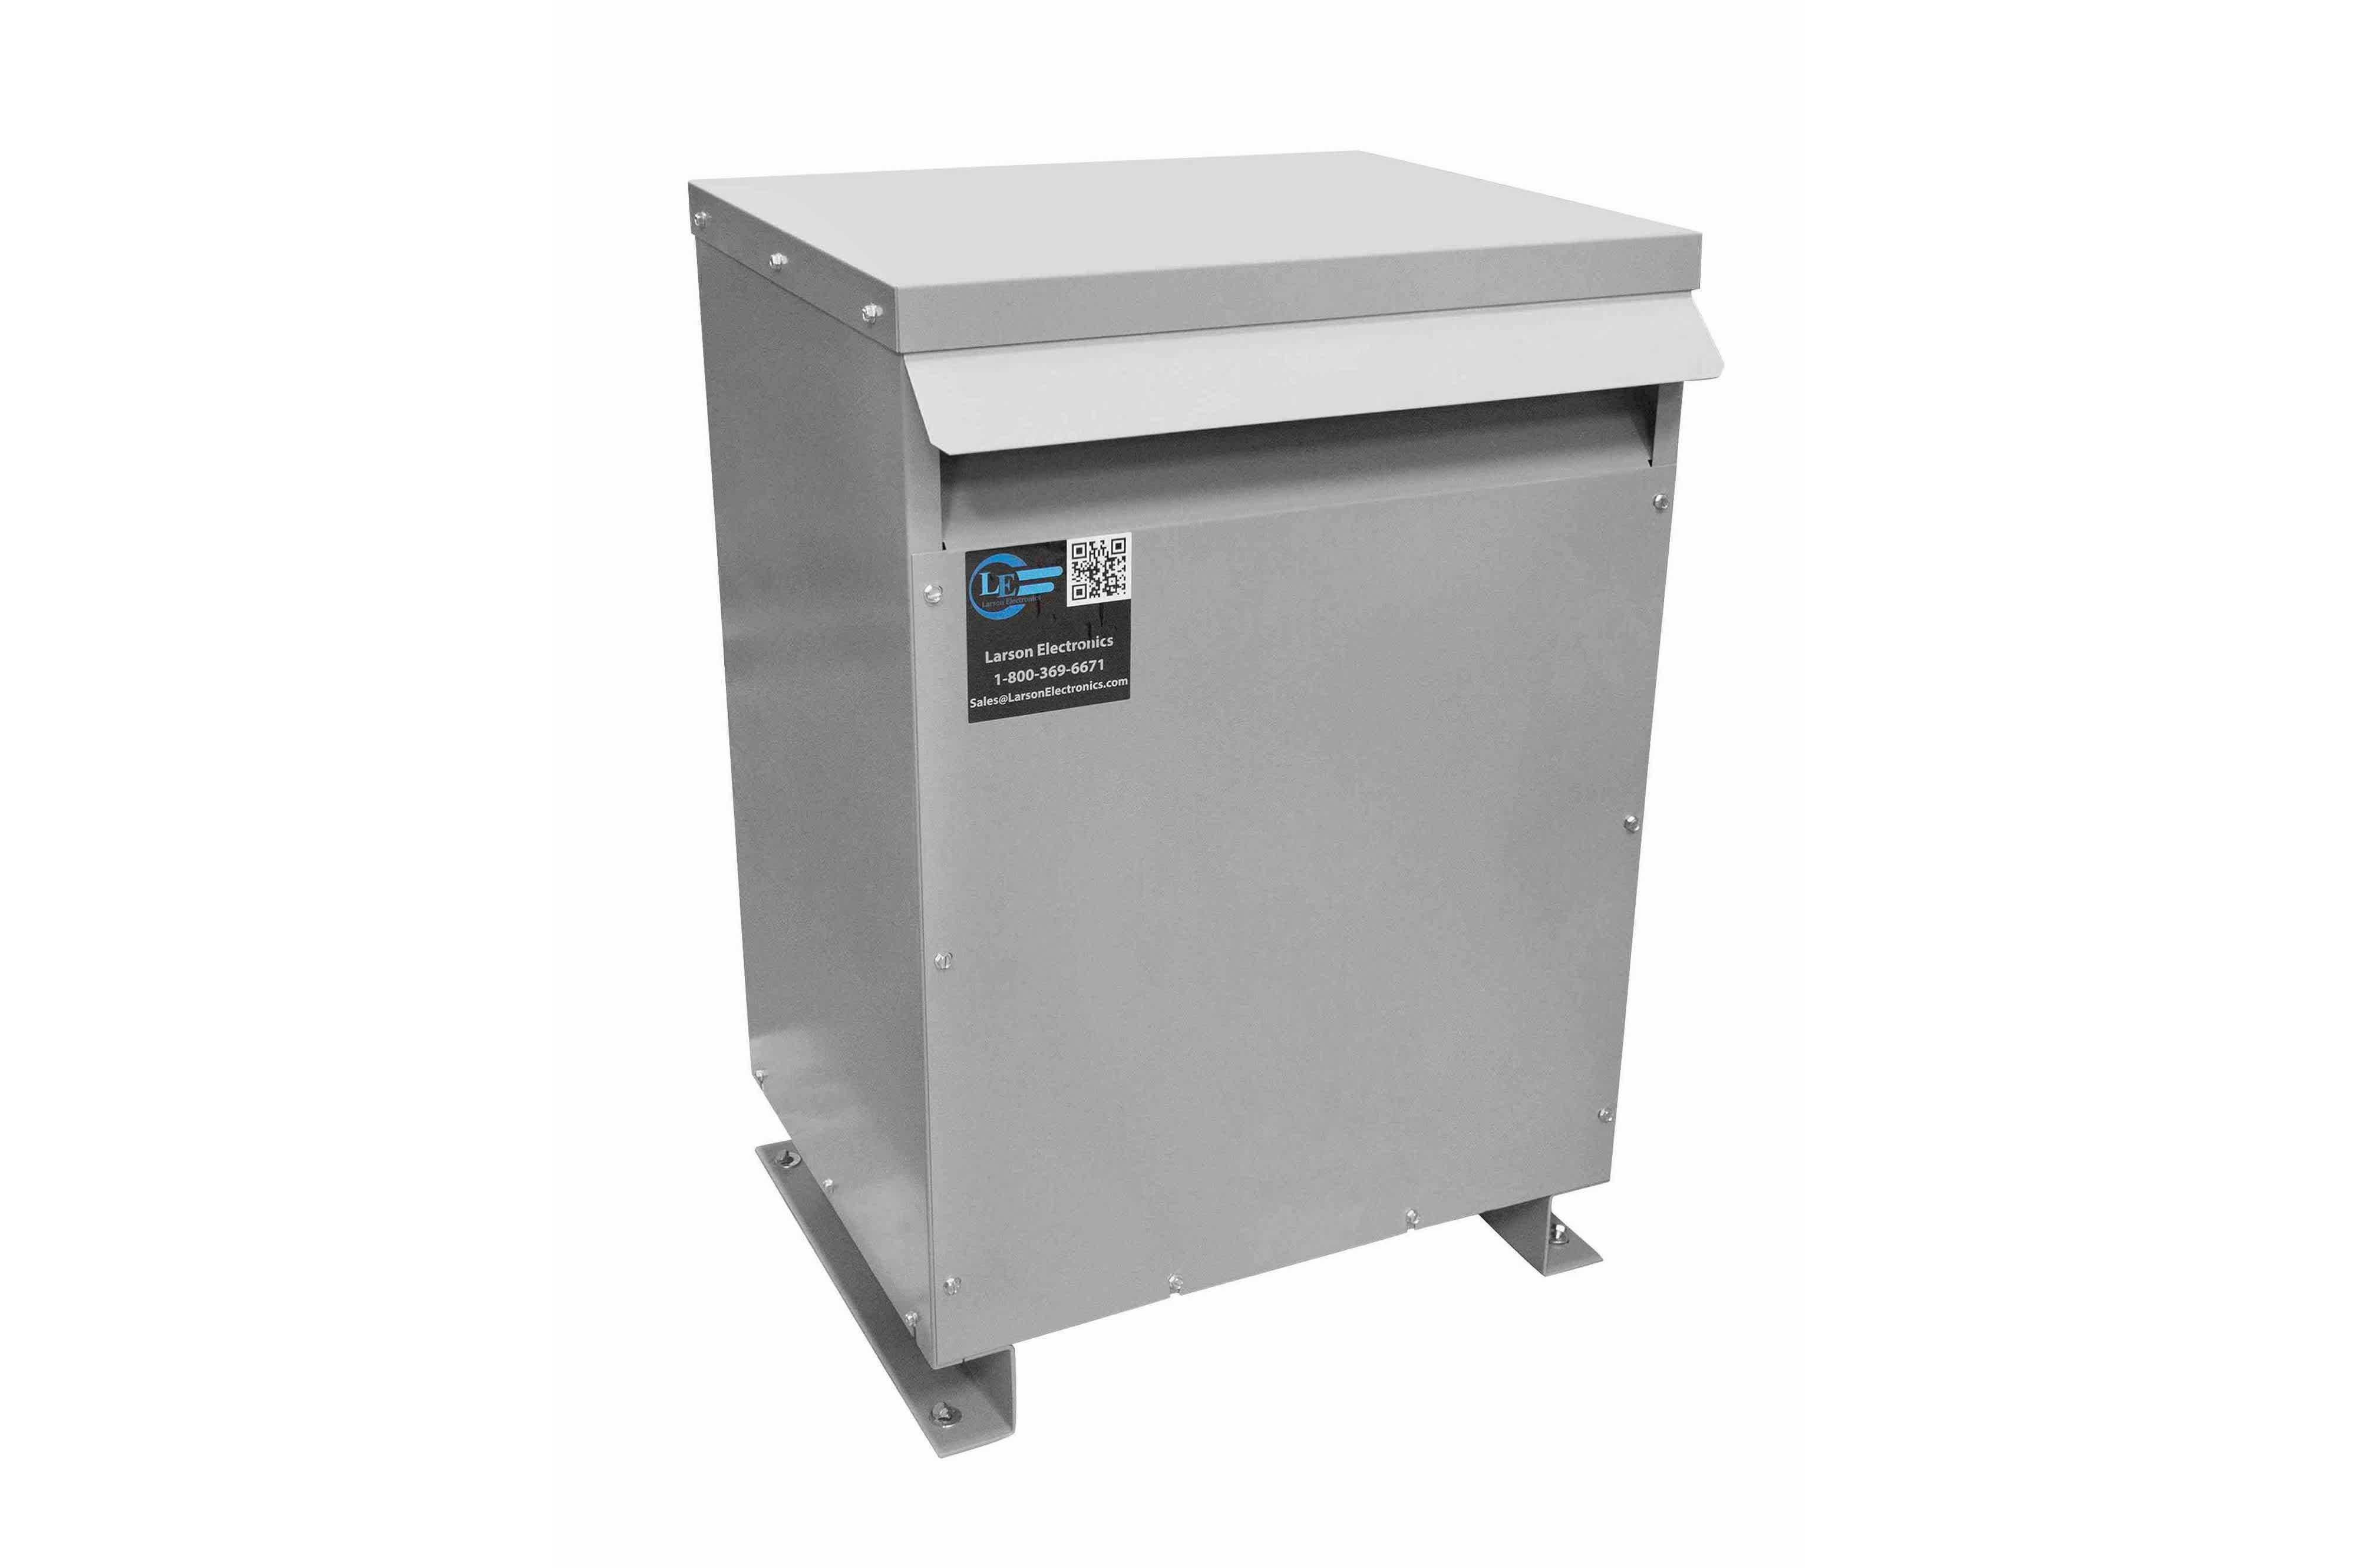 115 kVA 3PH Isolation Transformer, 600V Wye Primary, 400V Delta Secondary, N3R, Ventilated, 60 Hz